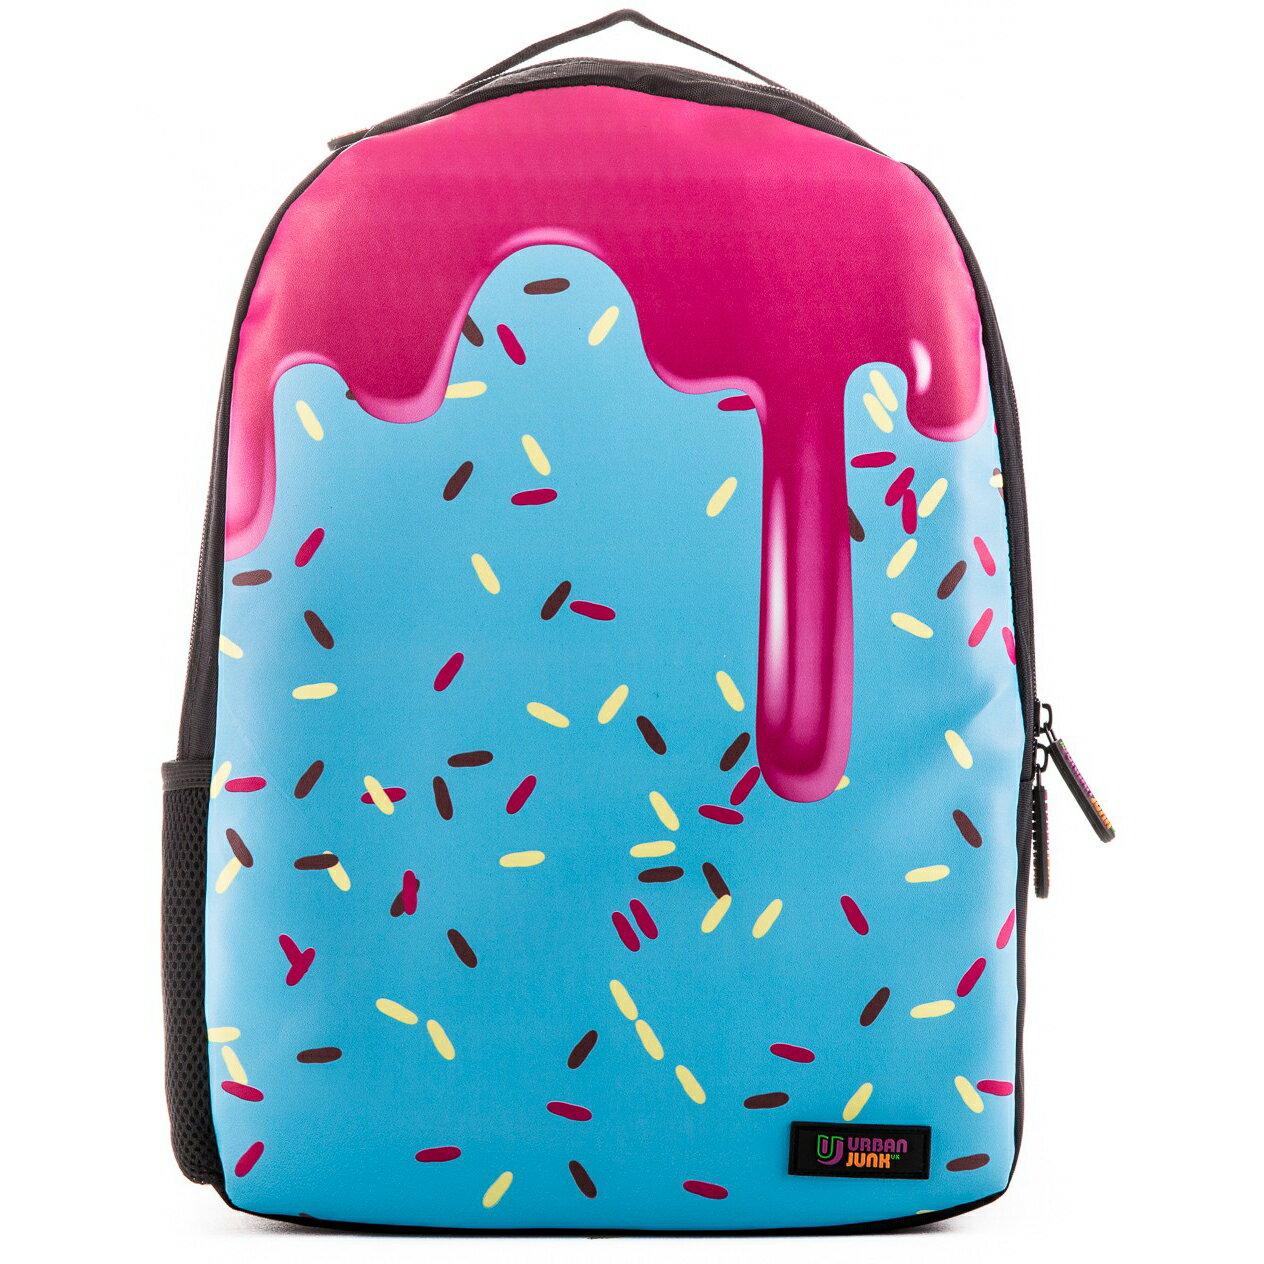 Urban Junk 'Hello Schweety' Girls Backpack 0